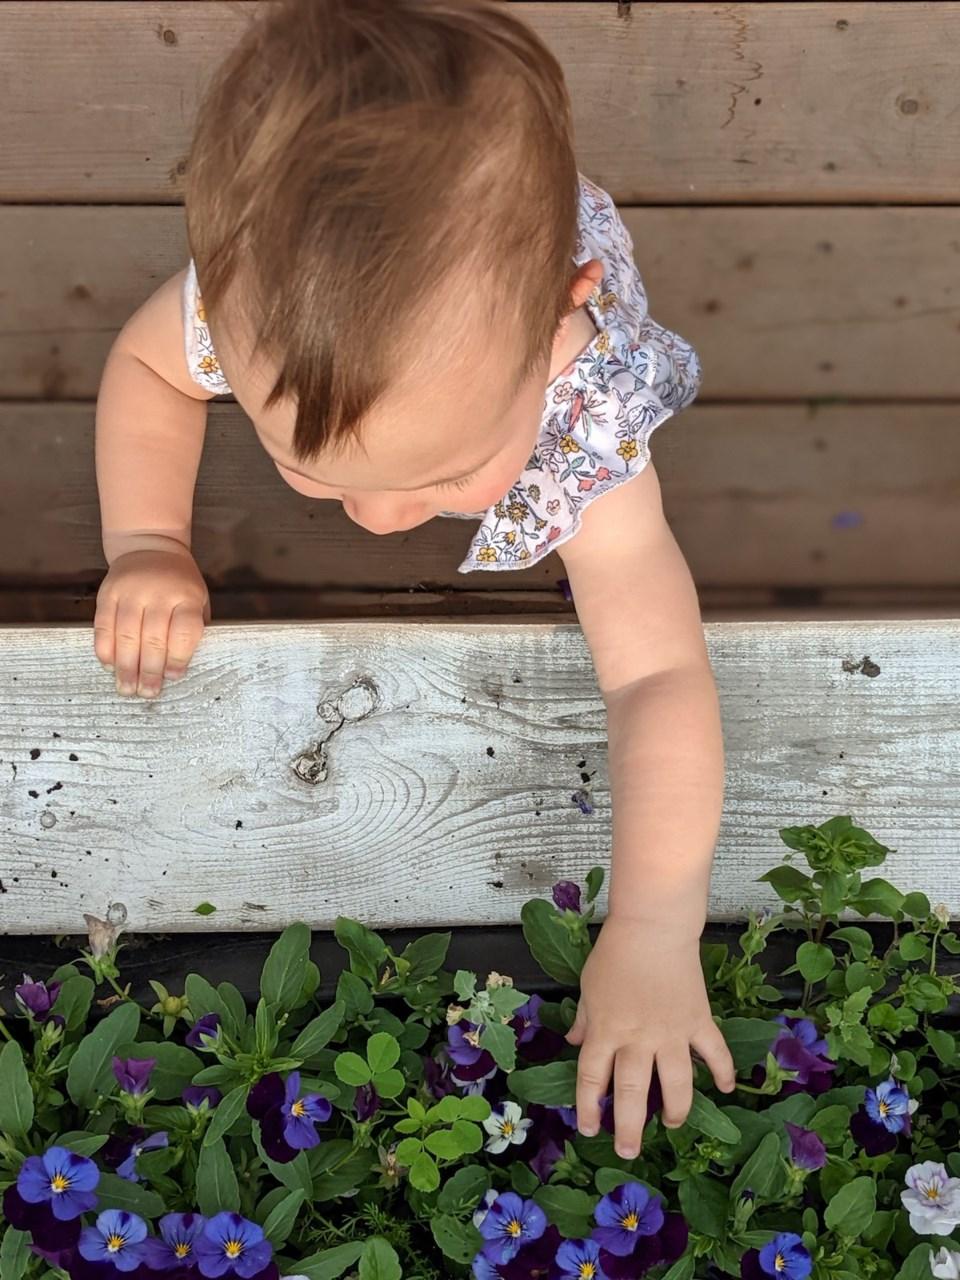 MomLife-Gardening-AMCullen